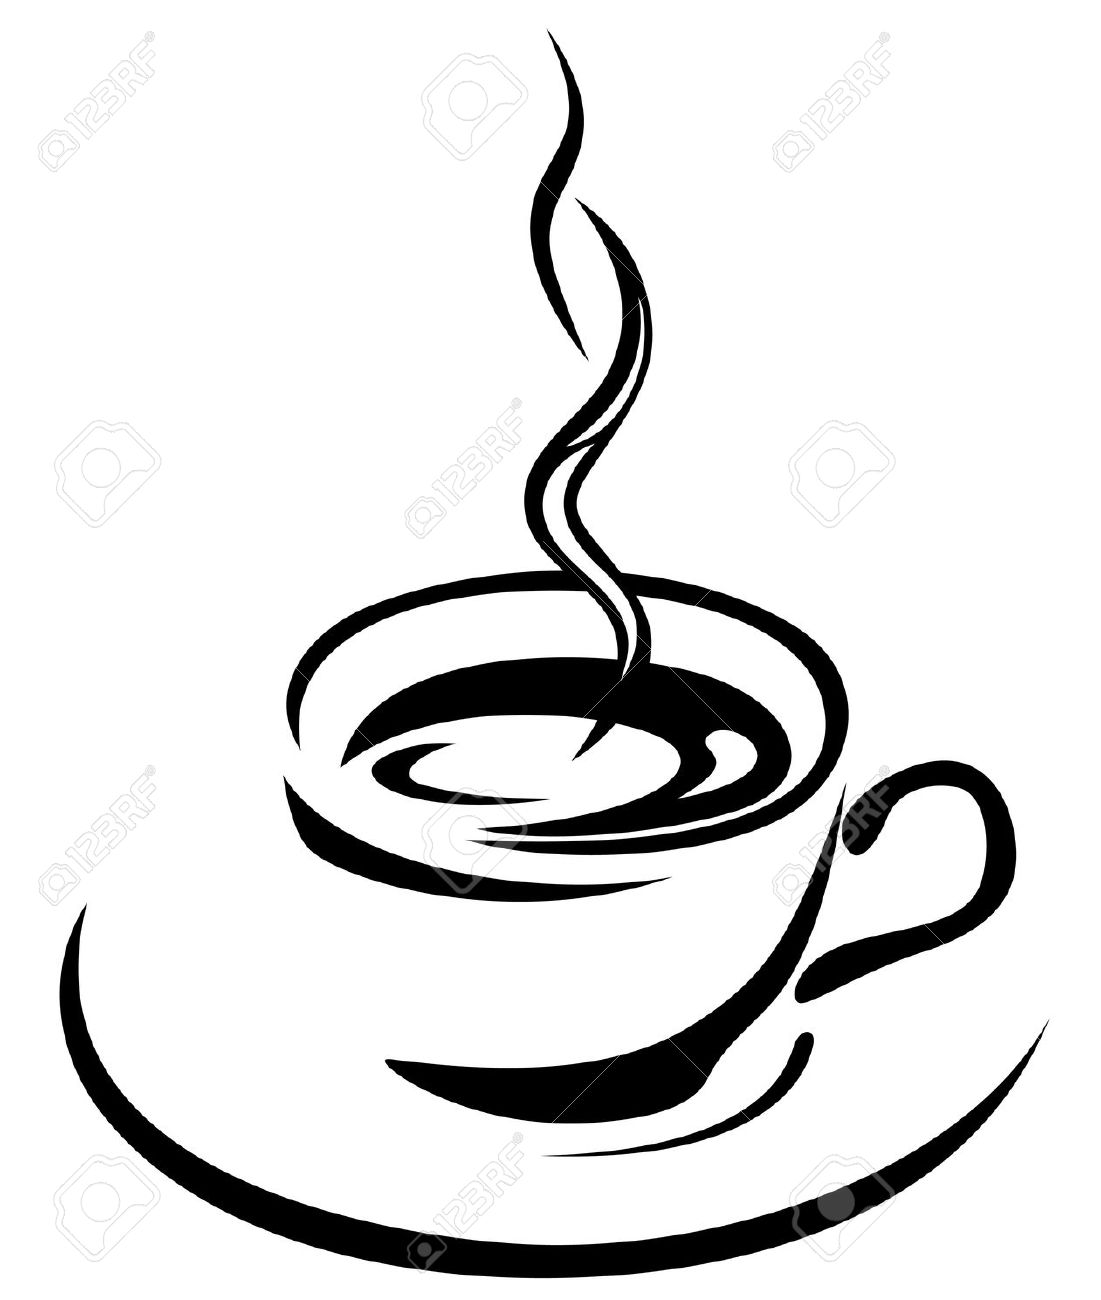 Coffee clipart drawn cup  Search Leaf a a